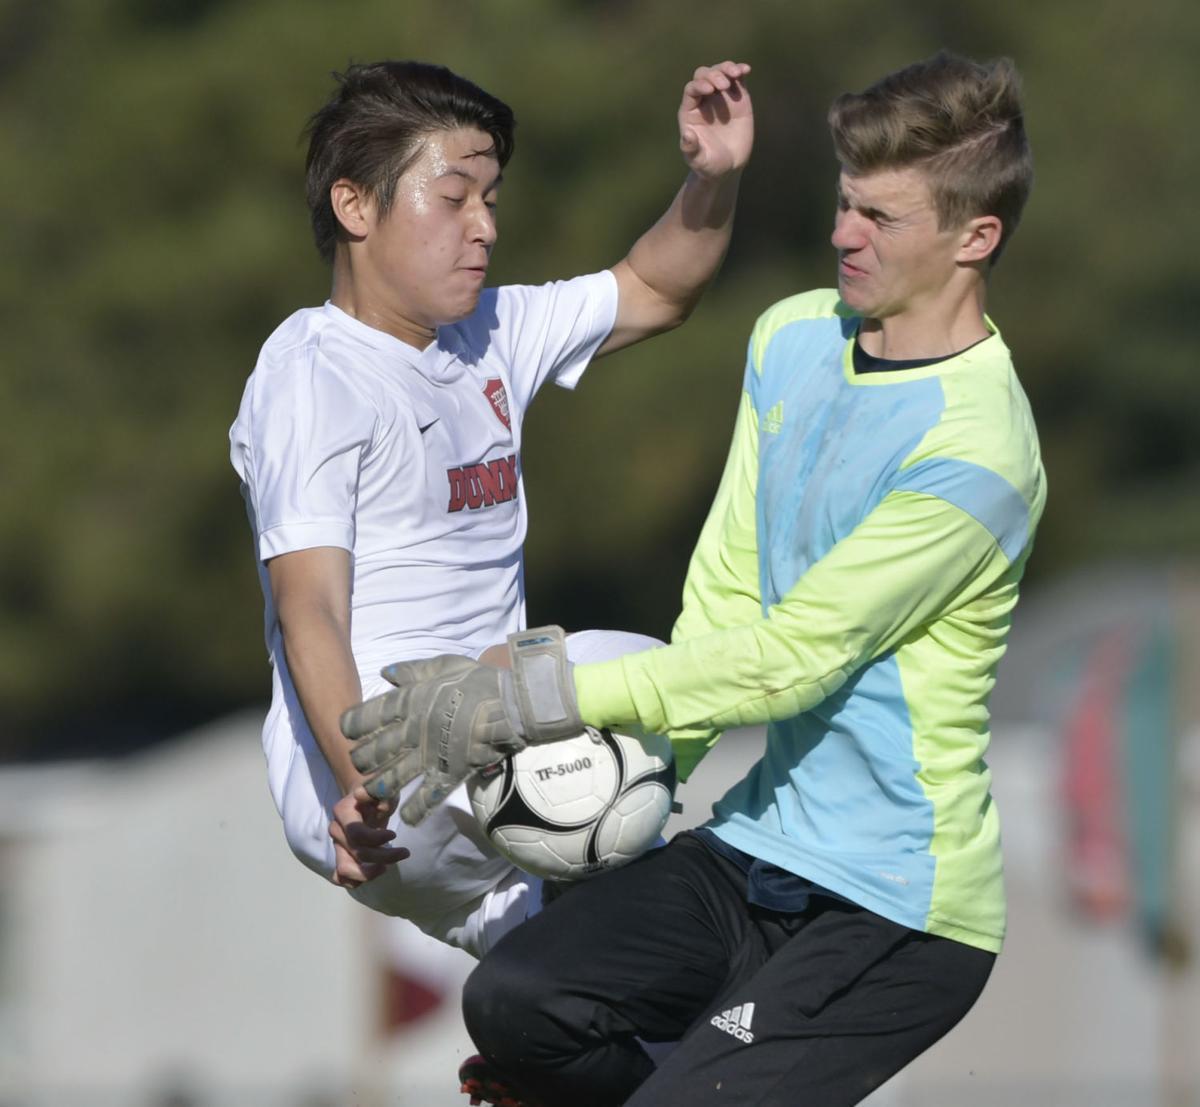 021618 Dunn School soccer 02.jpg